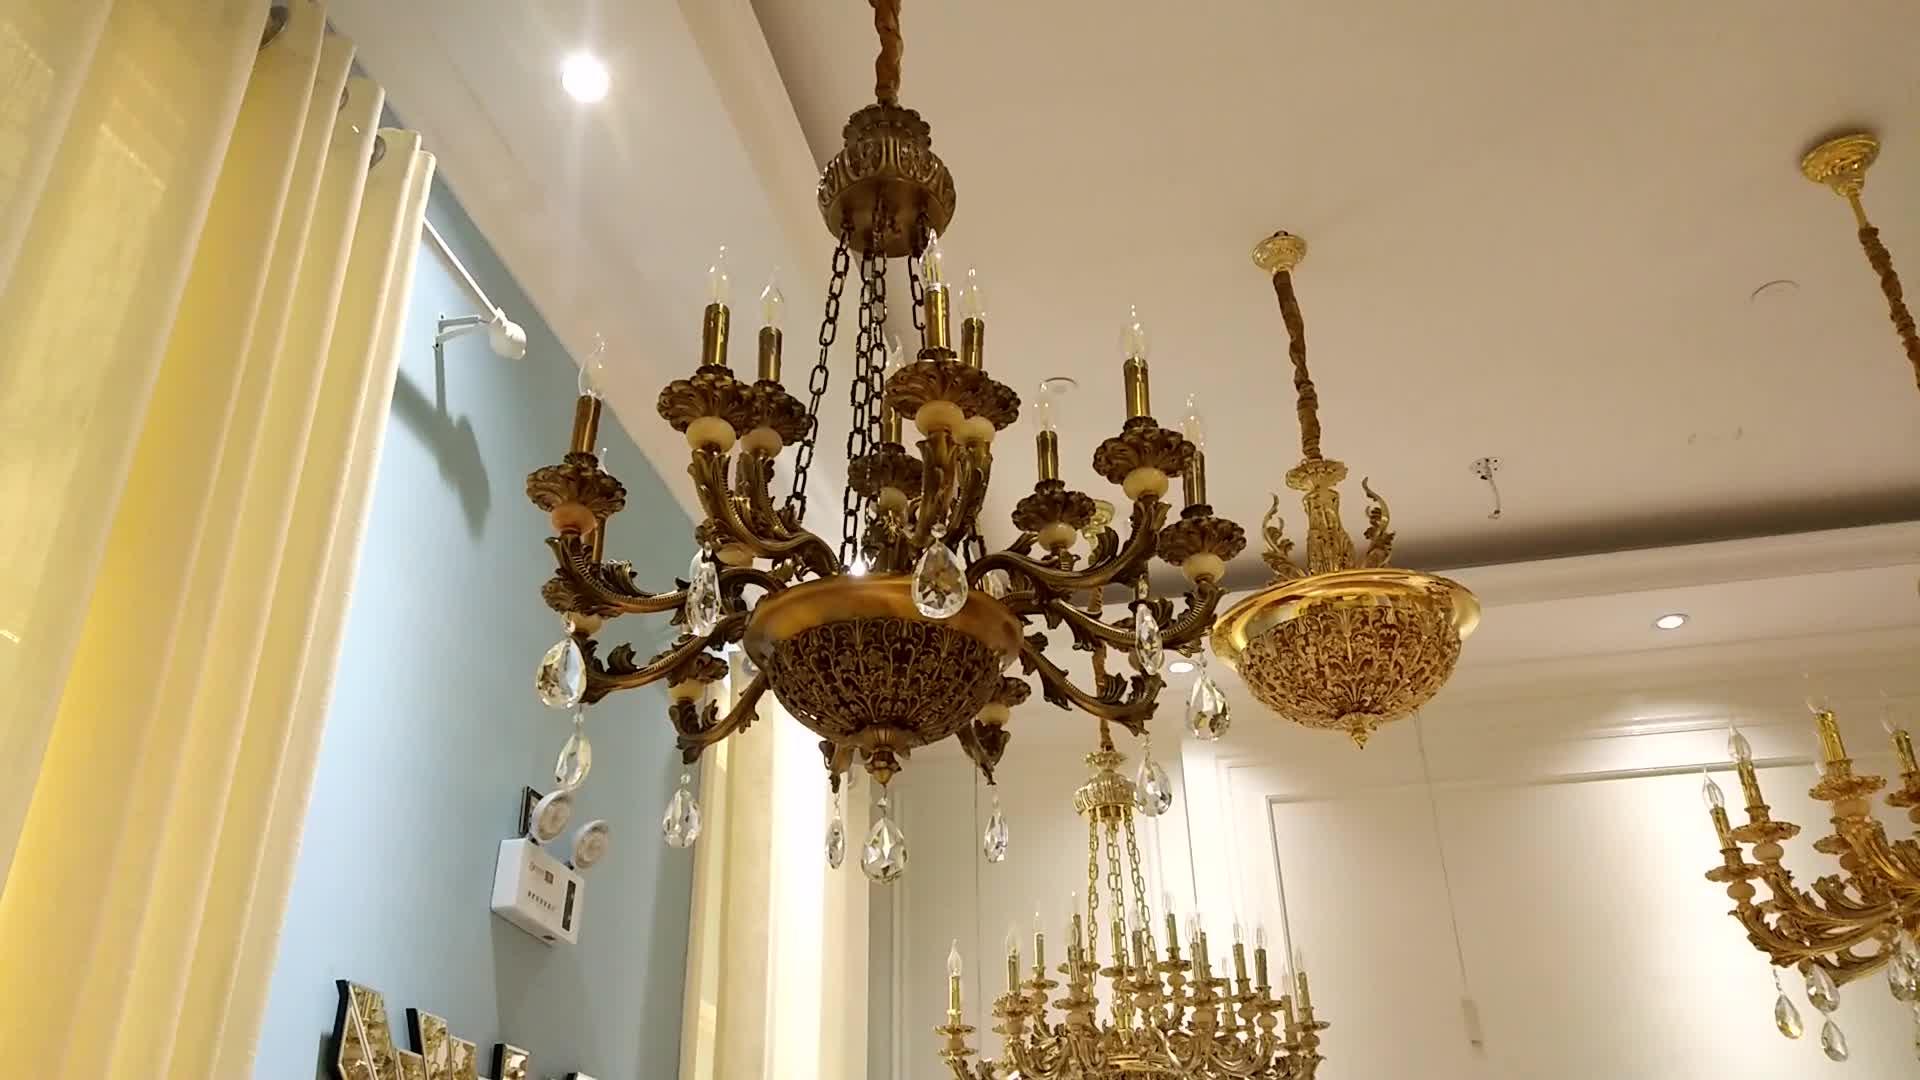 2020 HongKong Large hotel decoration chandelier modern zinc alloy Pendant Lights lighting fixtures